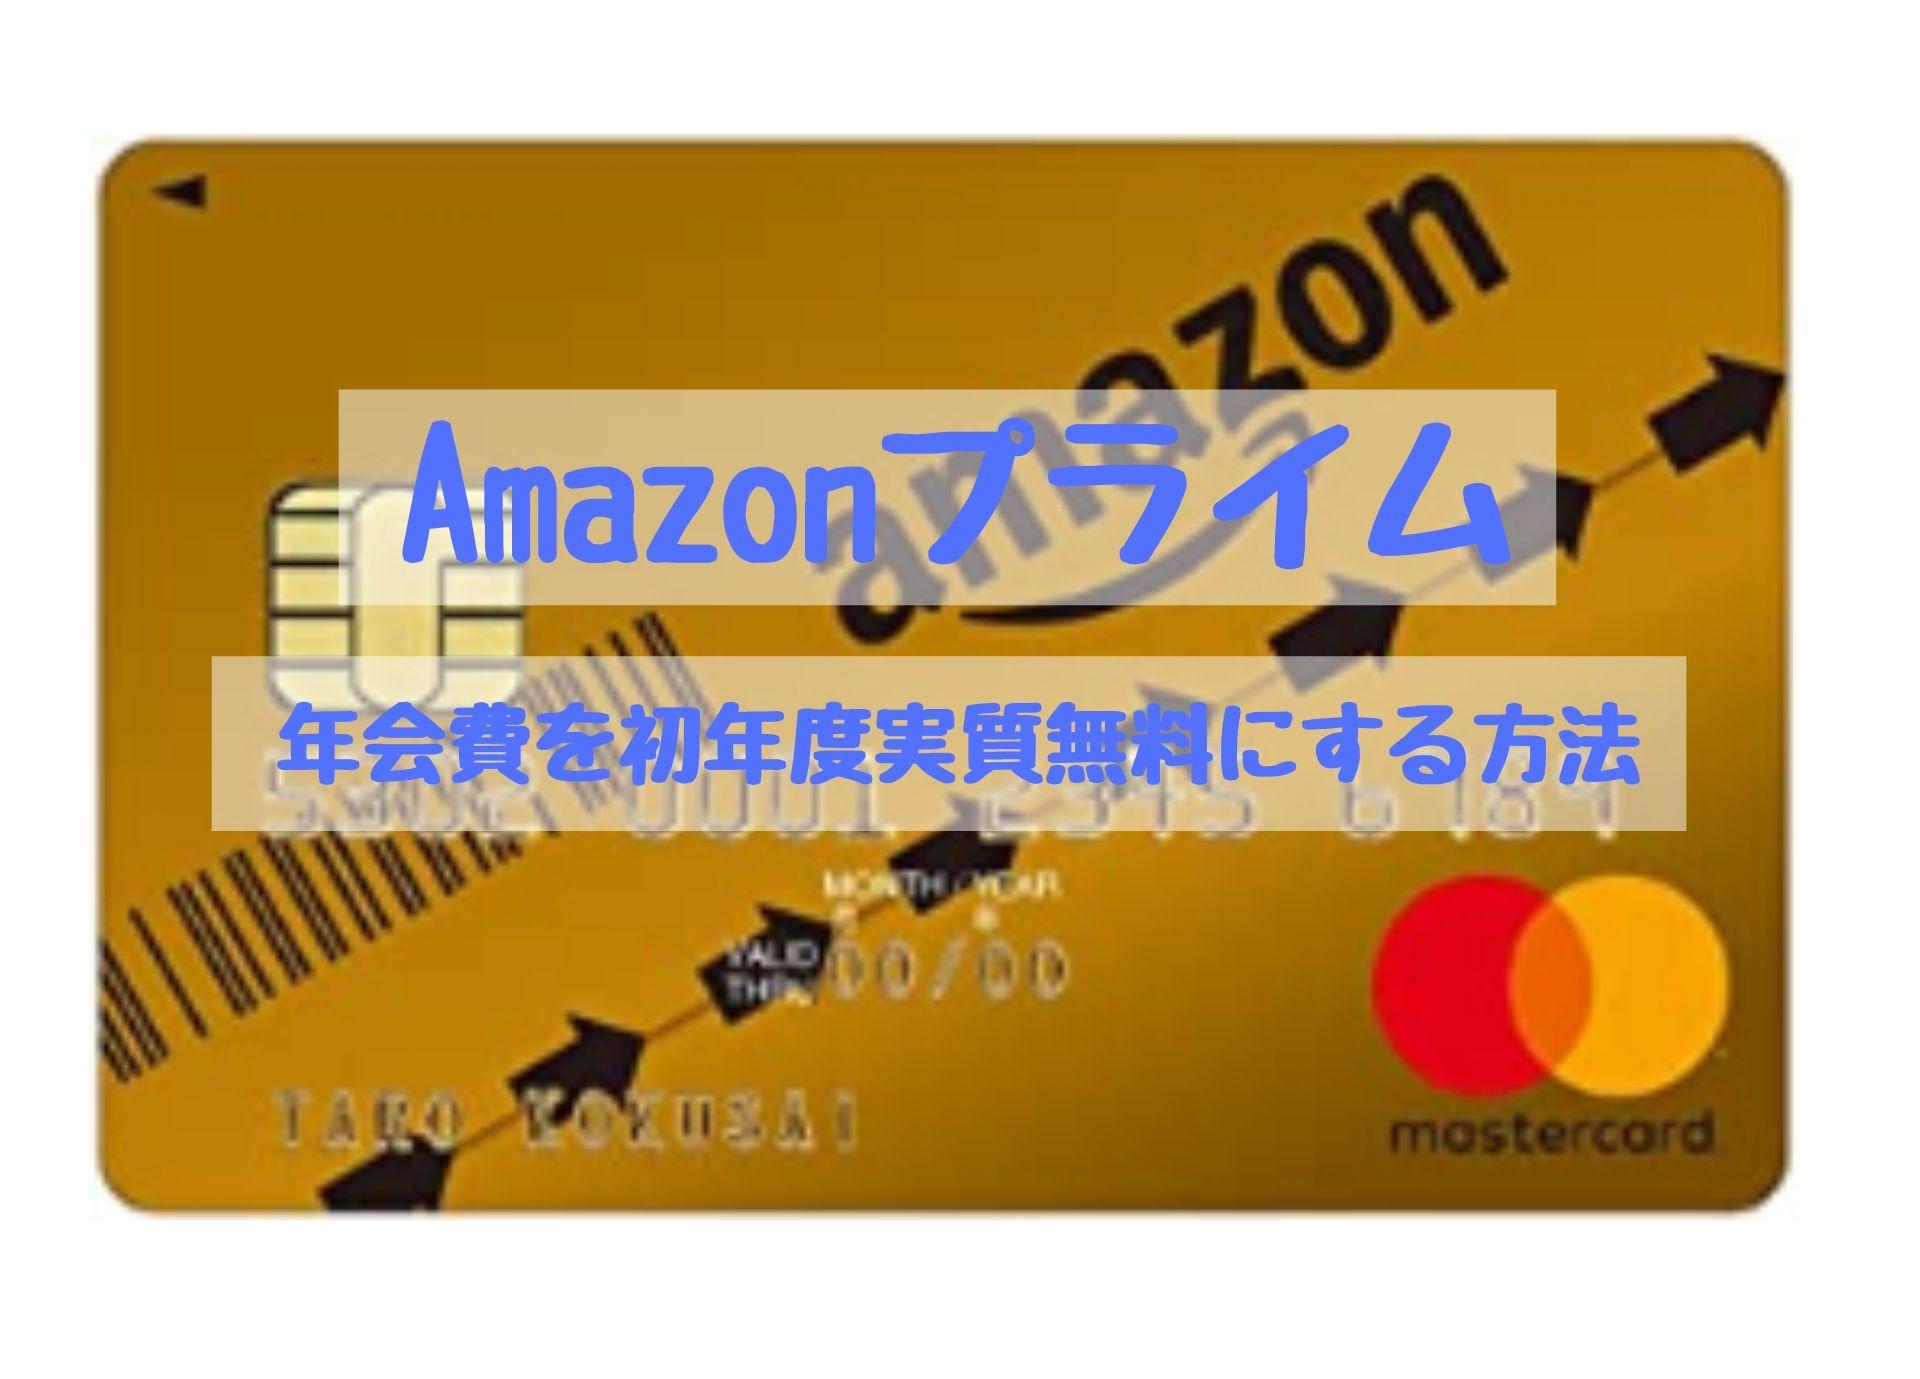 Amazonゴールドカードを実質初年度無料にする裏技!